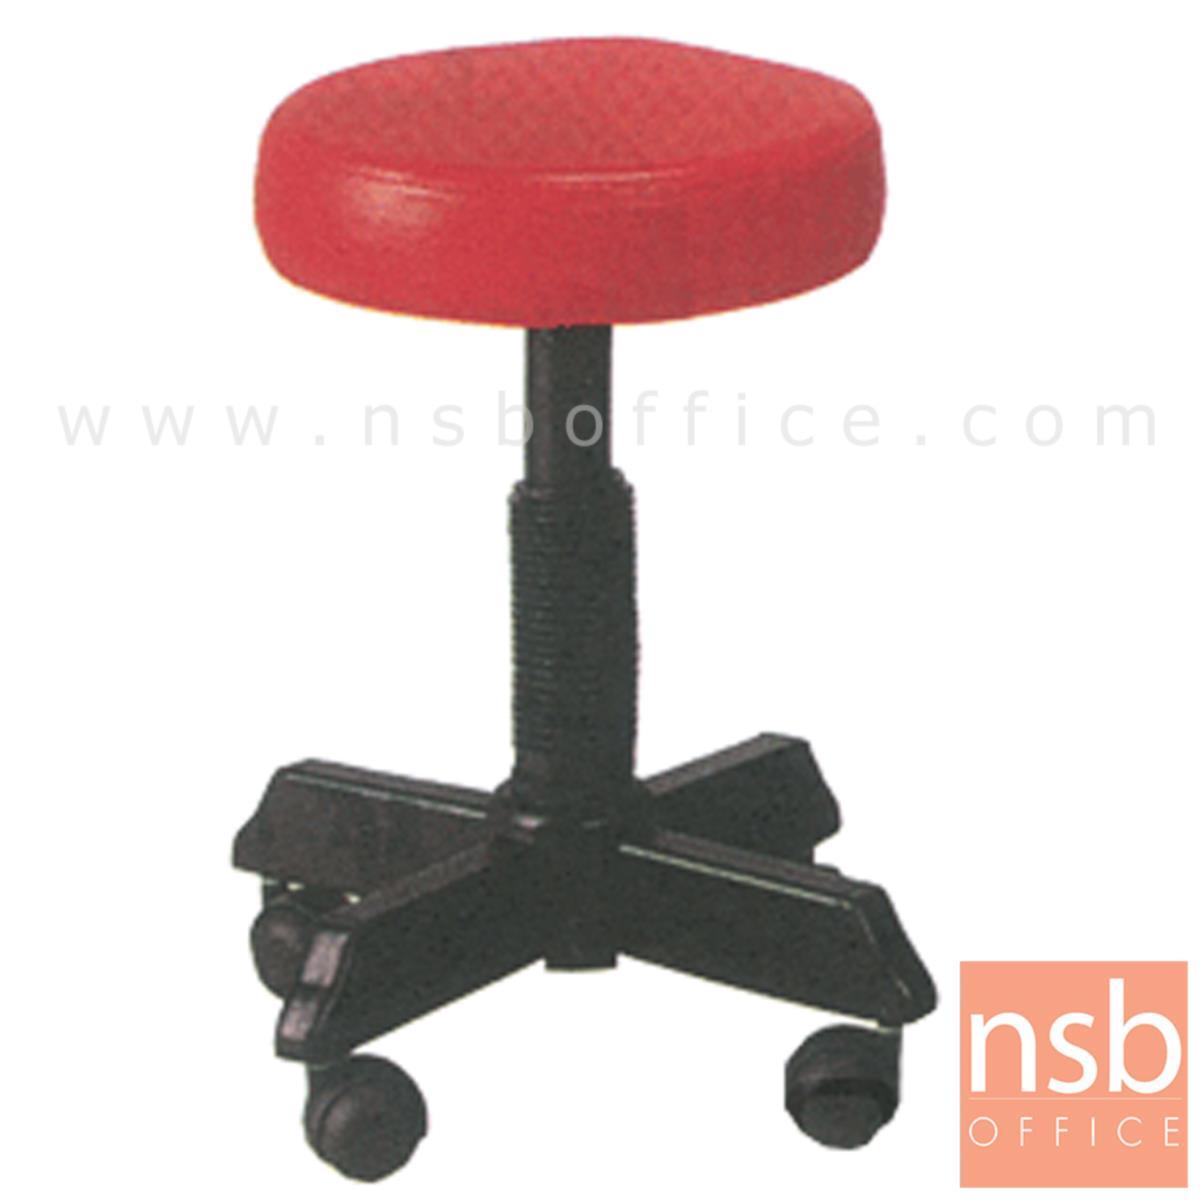 B09A077:เก้าอี้บาร์สตูลที่นั่งกลมล้อเลื่อน รุ่น New Hope  ขาเหล็กล้อ 5 แฉก